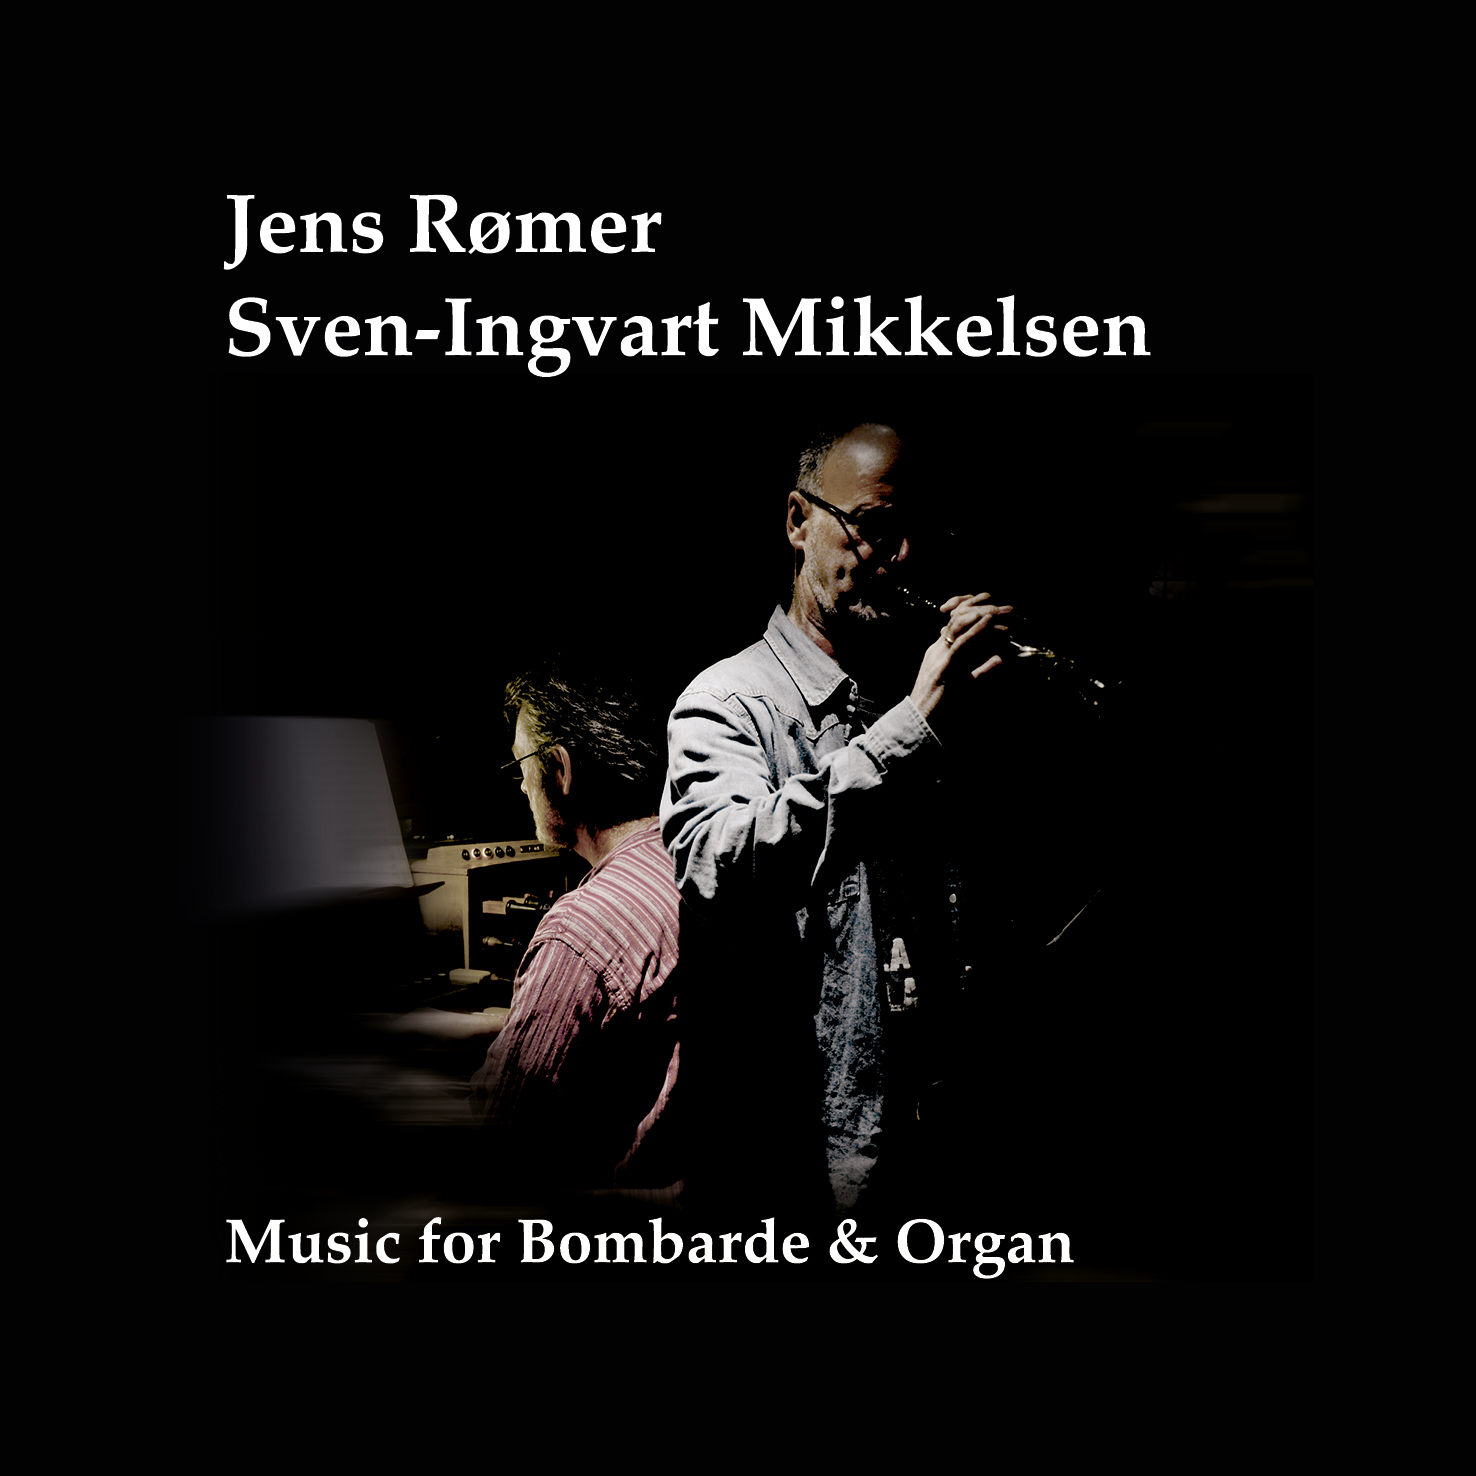 Music for Organ & Bombarde